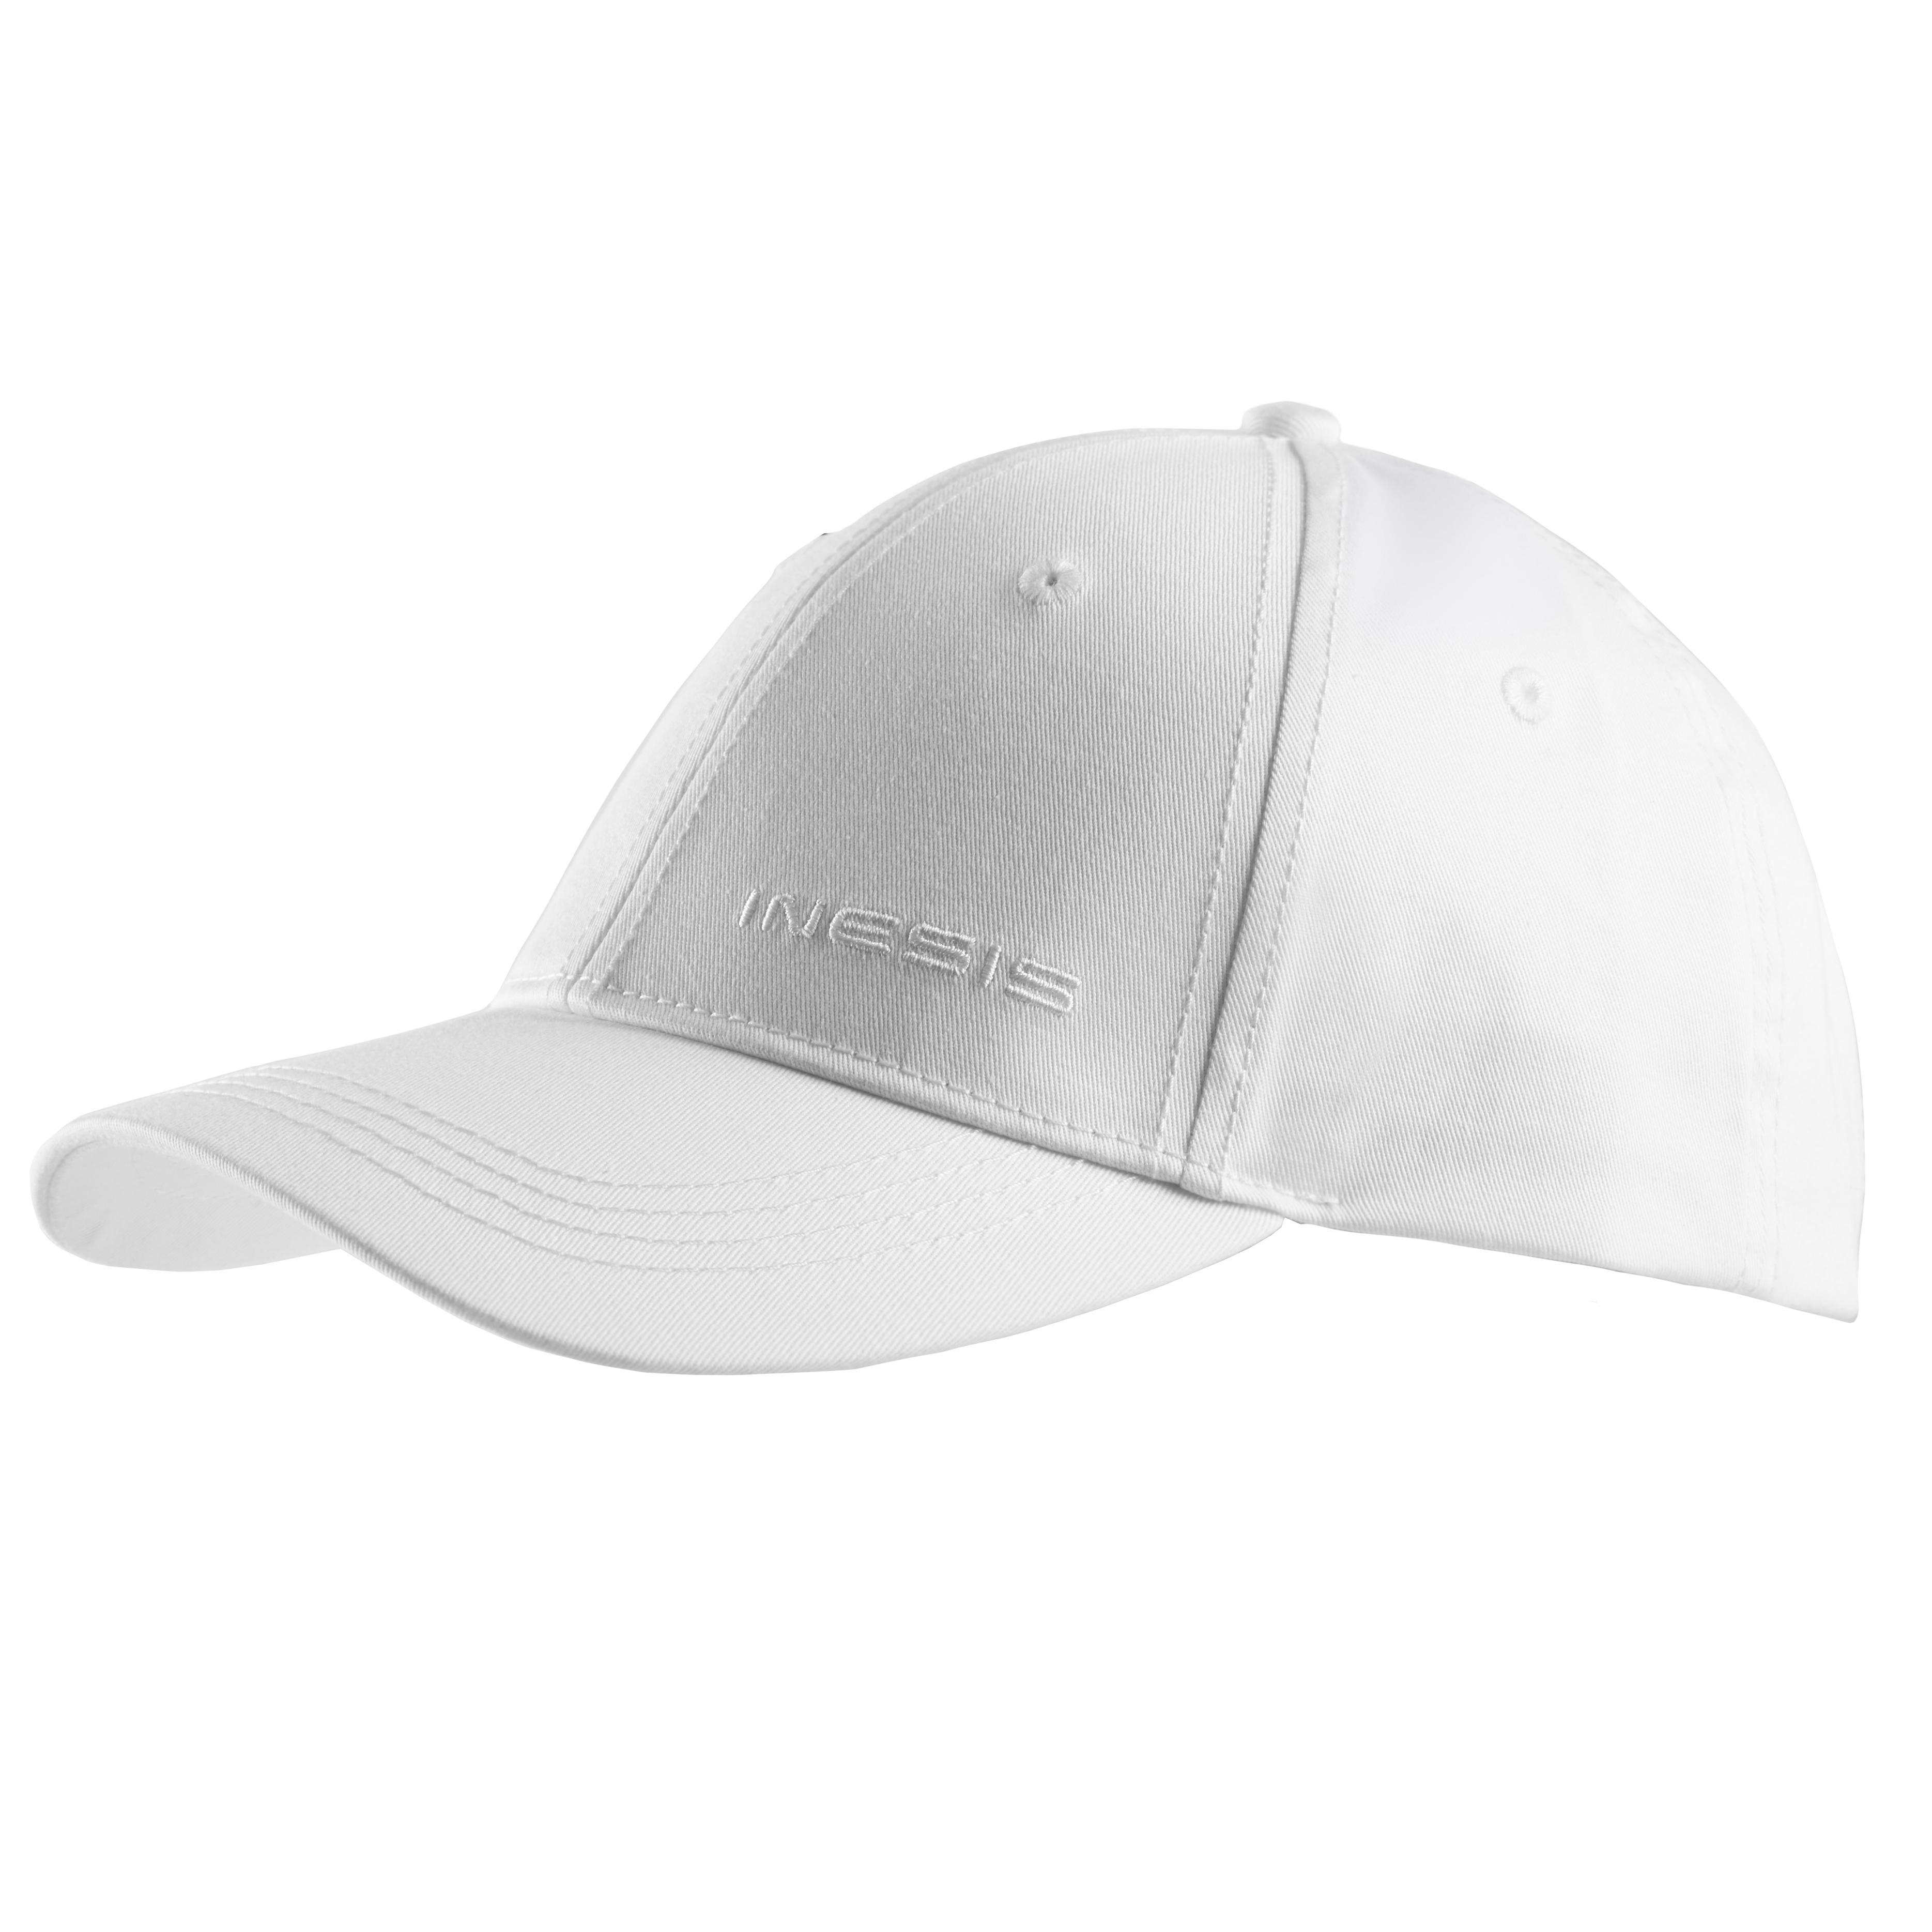 Şapcă Golf Alb Adulți imagine